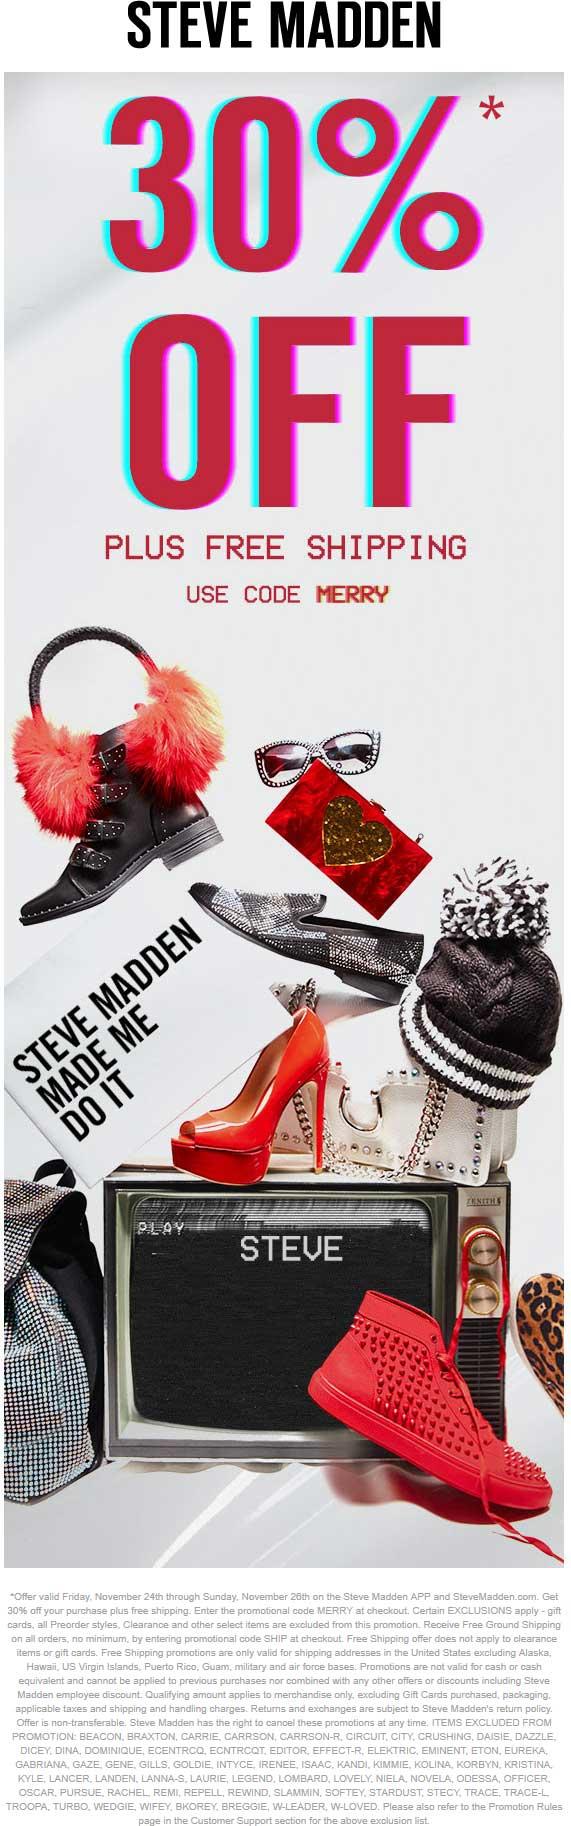 SteveMadden.com Promo Coupon 30% off online + free ship at Steve Madden via promo code MERRY